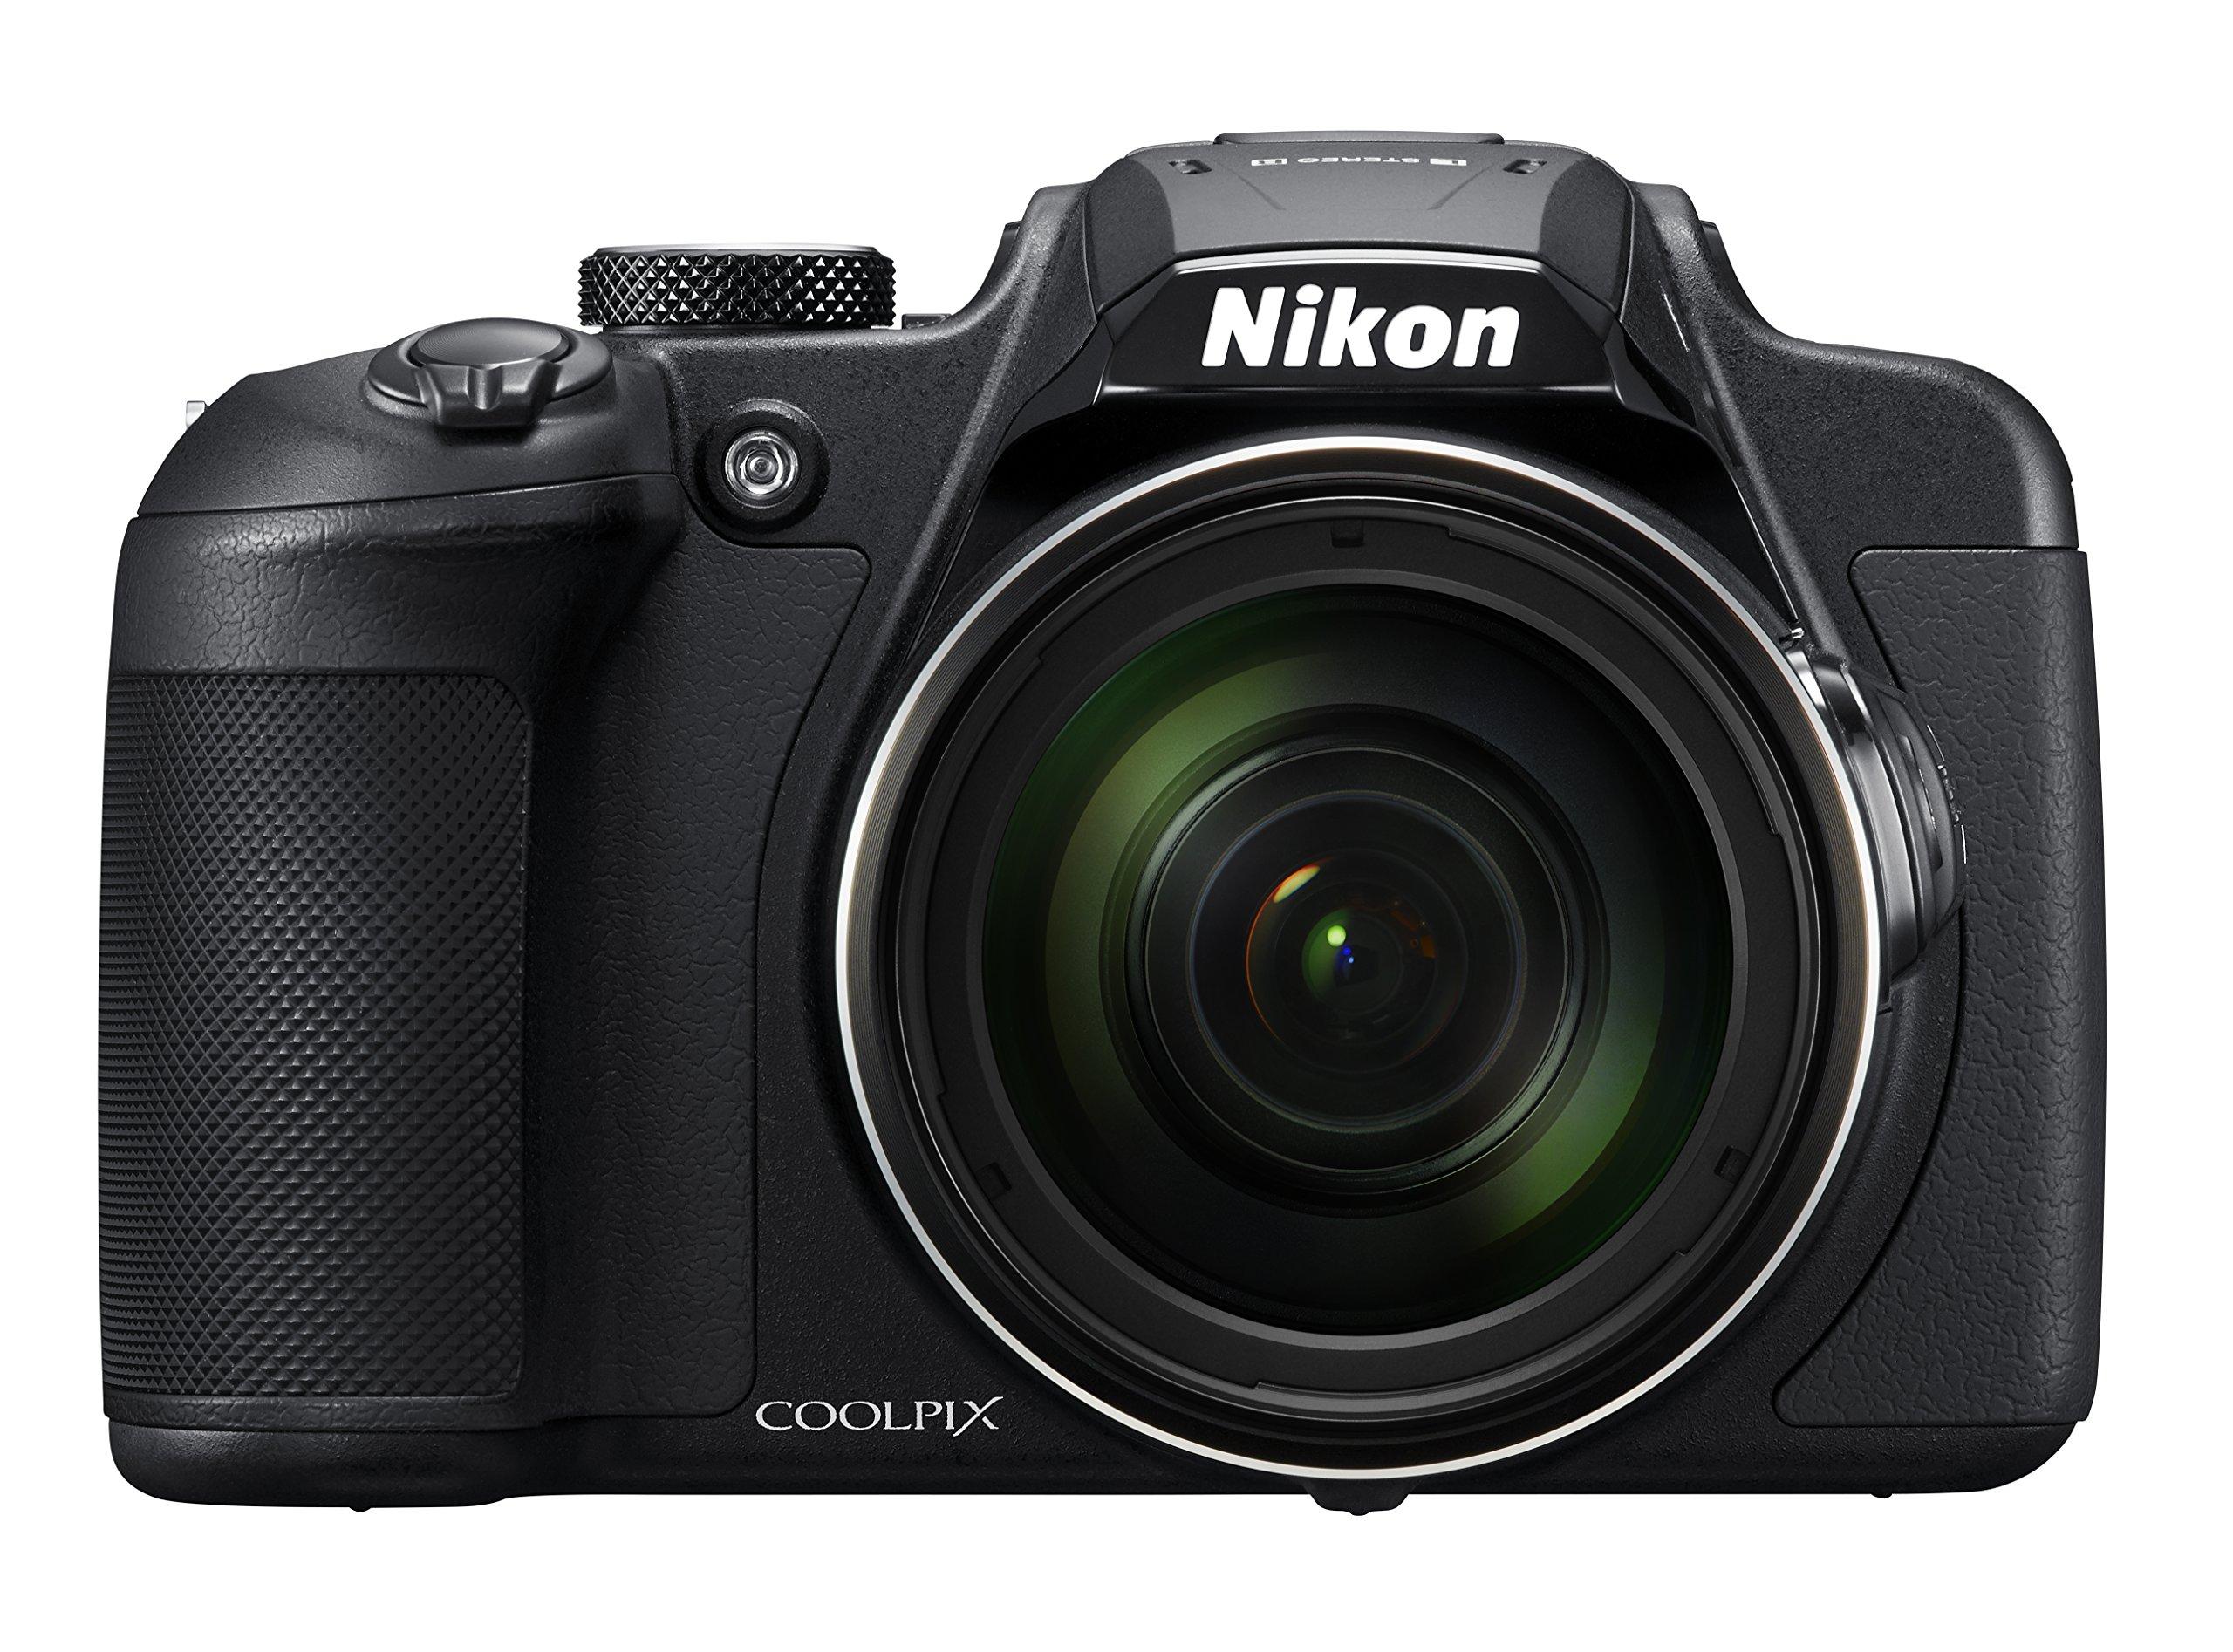 Nikon COOLPIX B700 Digital Camera by Nikon